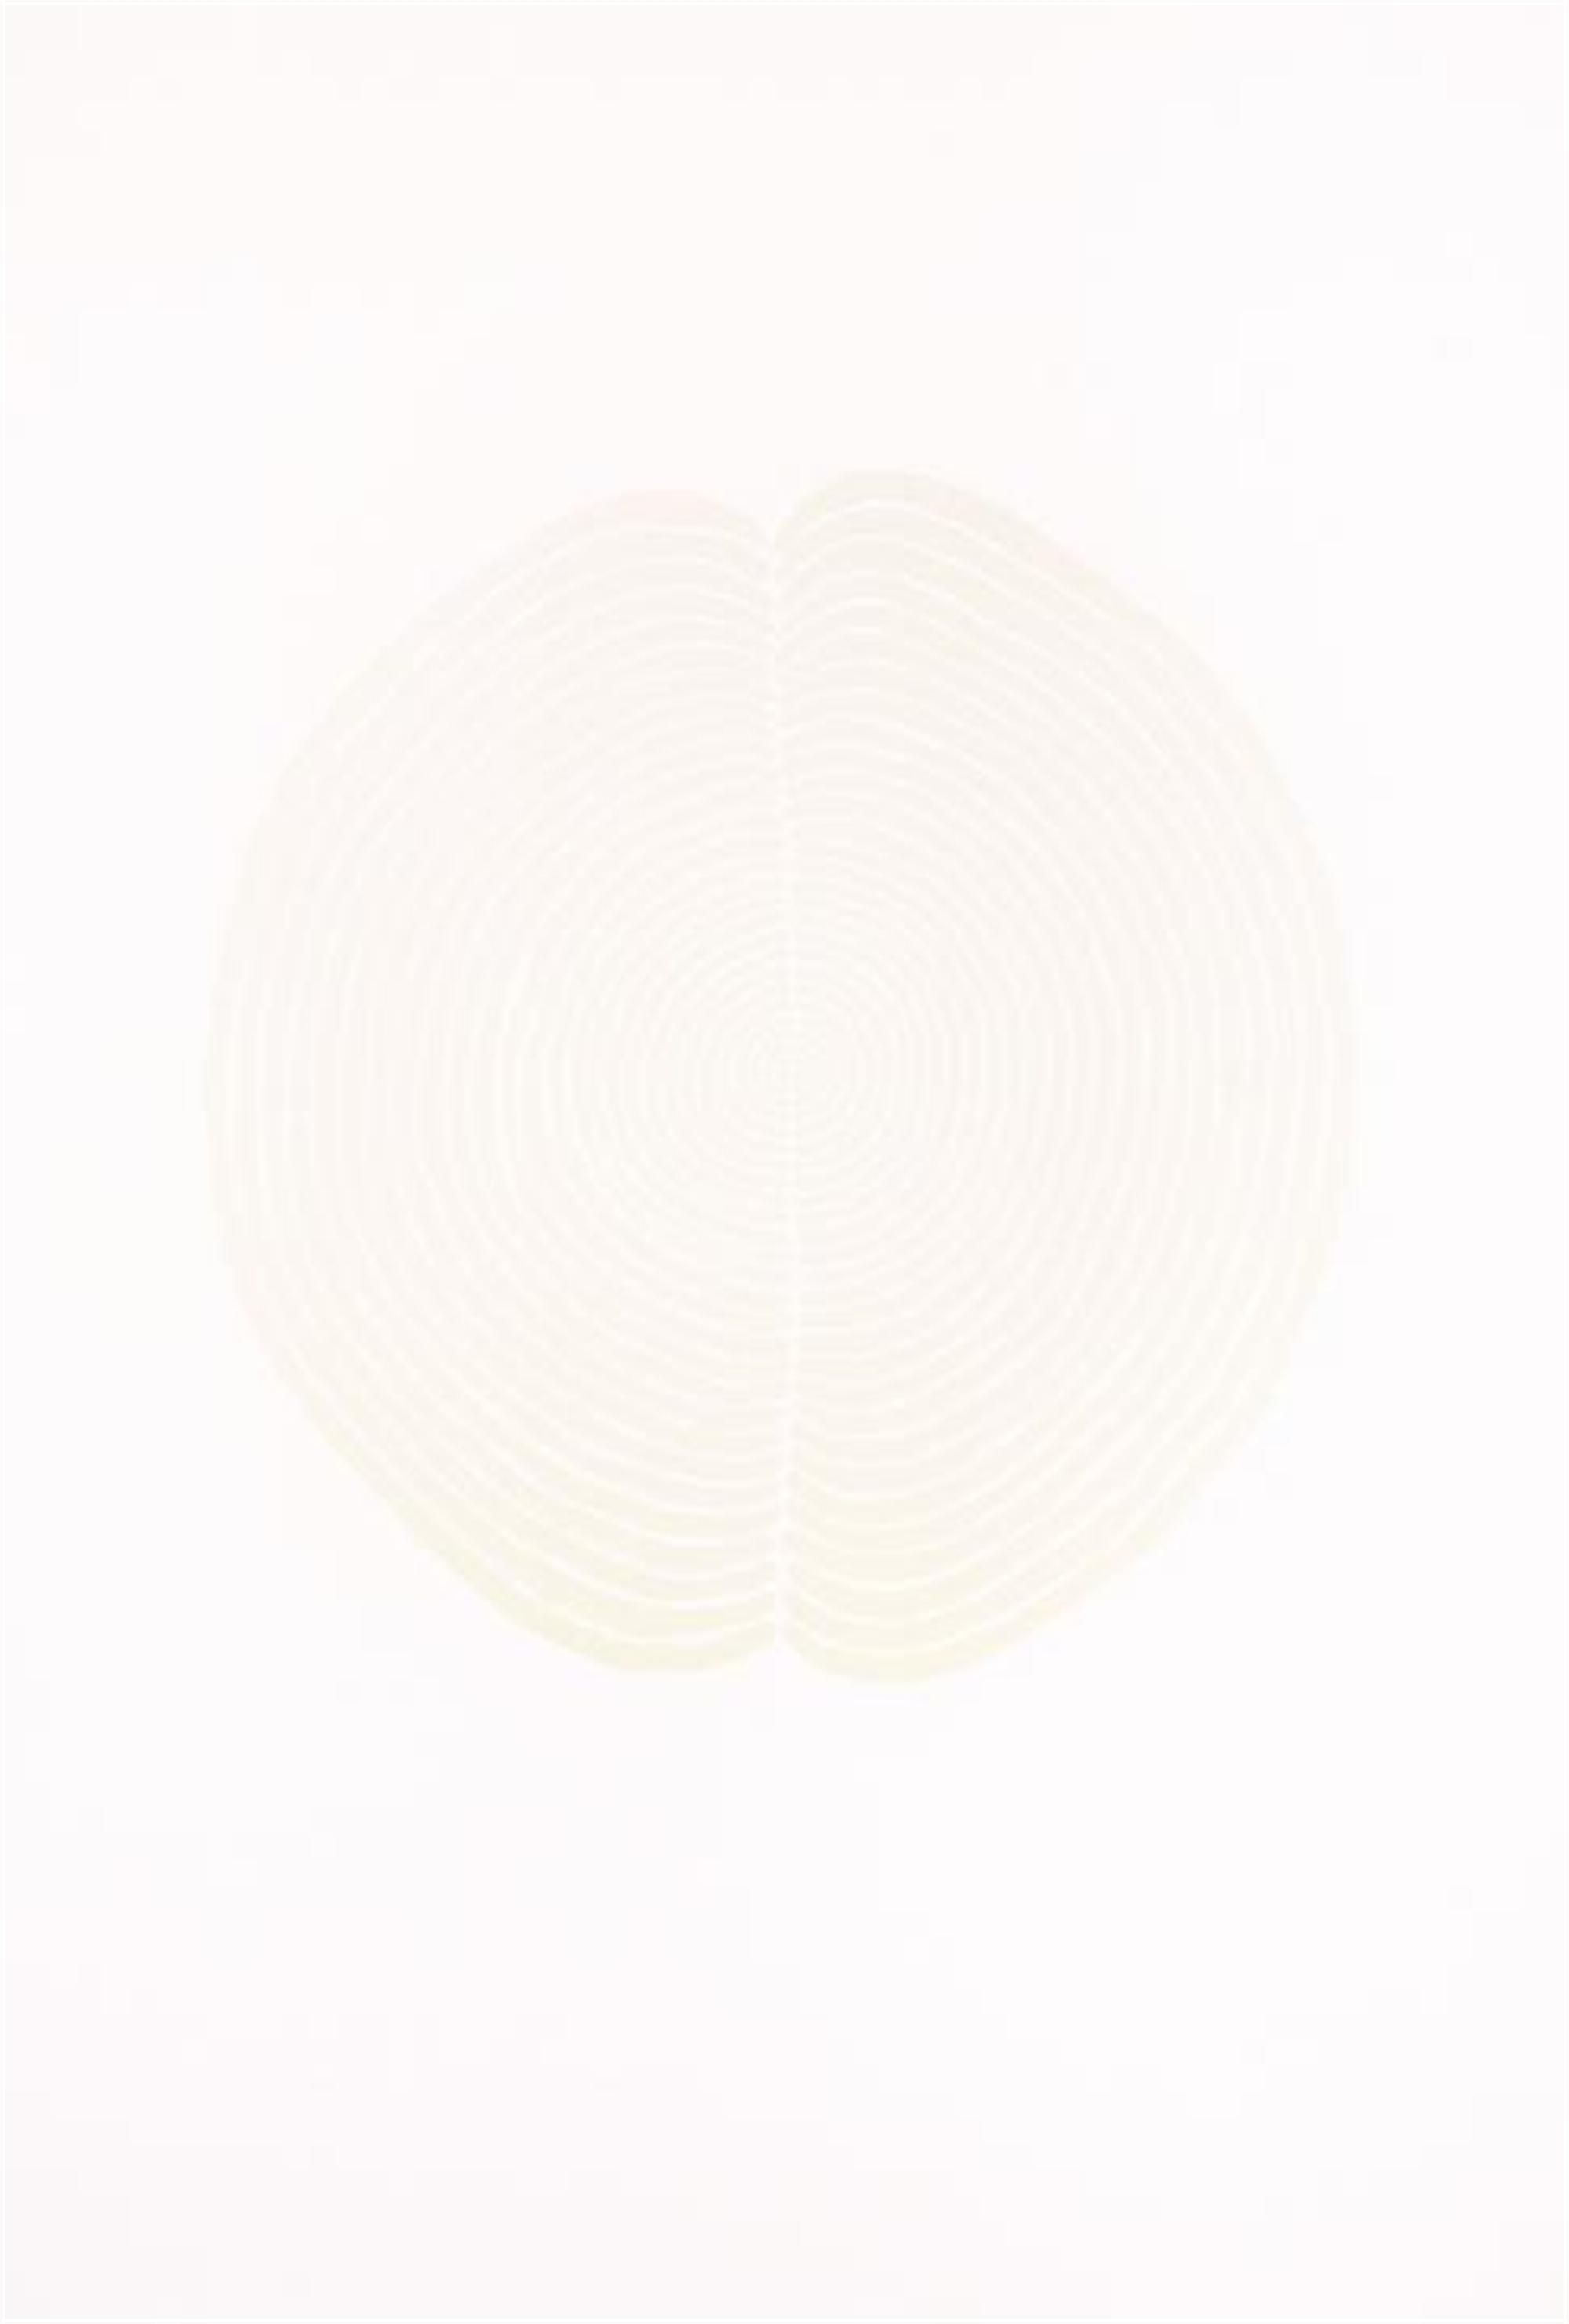 Brain Field by Antony Gormley